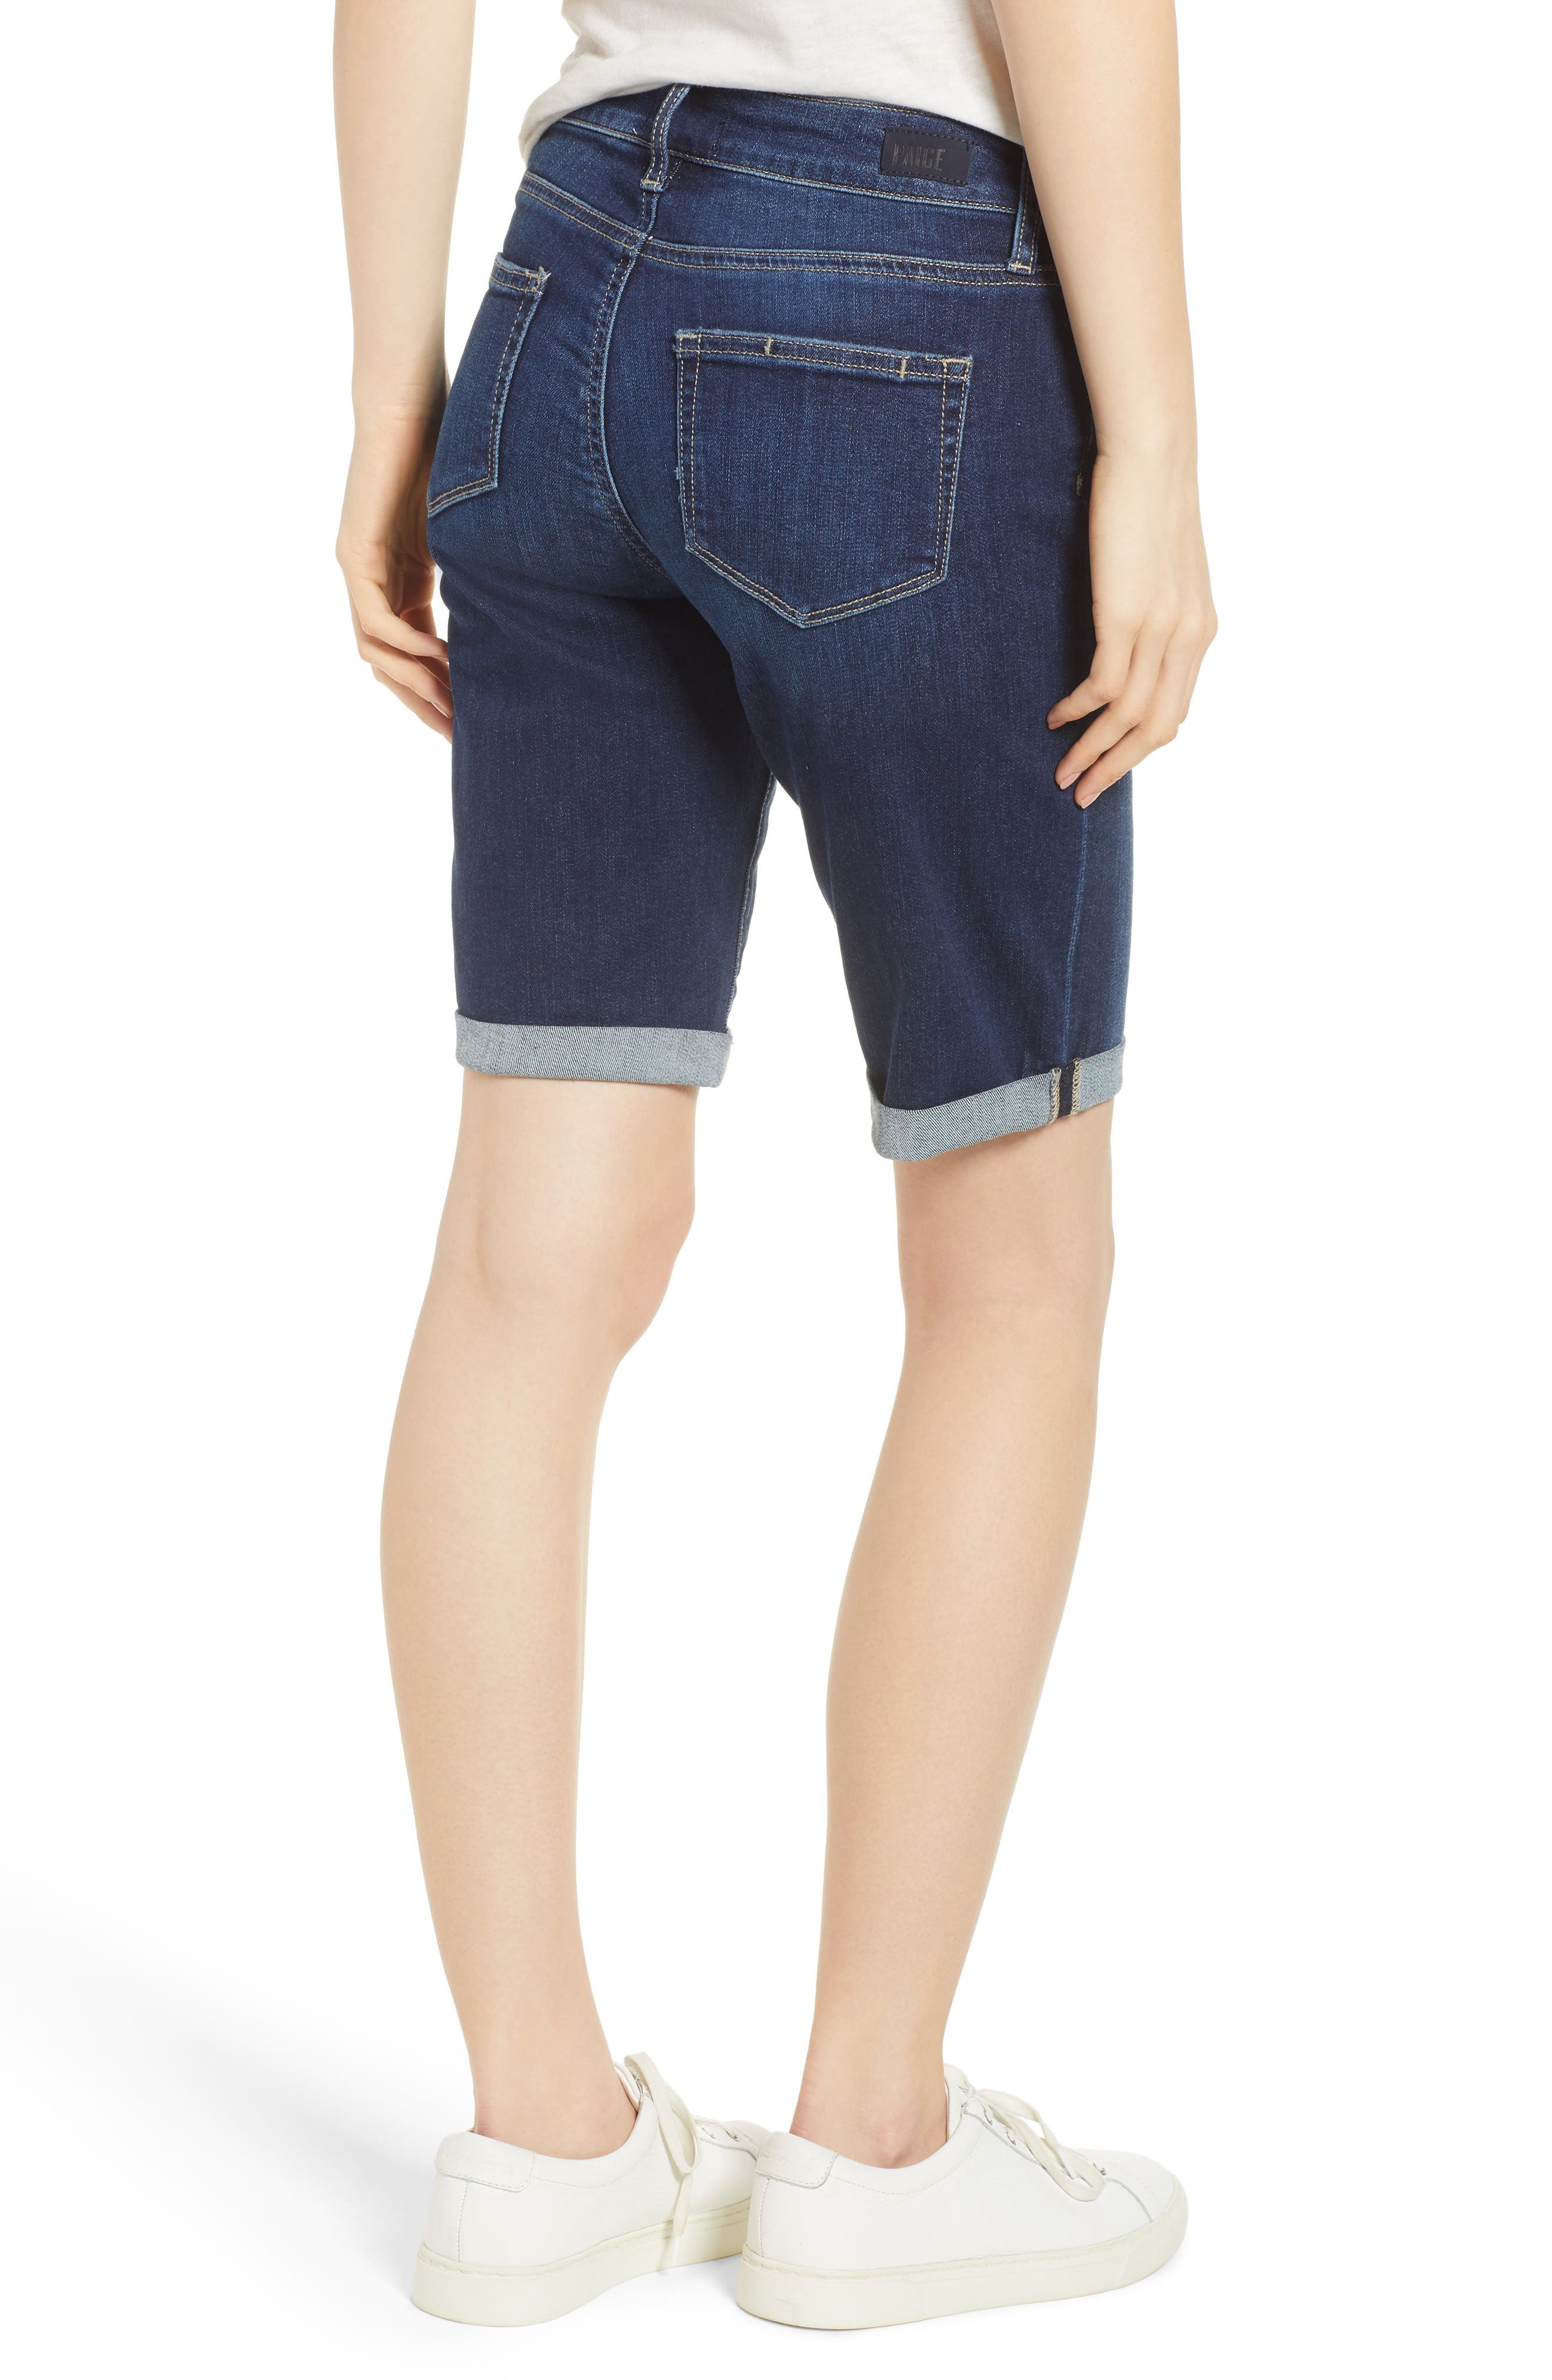 Transcend Vintage - Jax Denim Bermuda Shorts,                             Alternate thumbnail 2, color,                             400